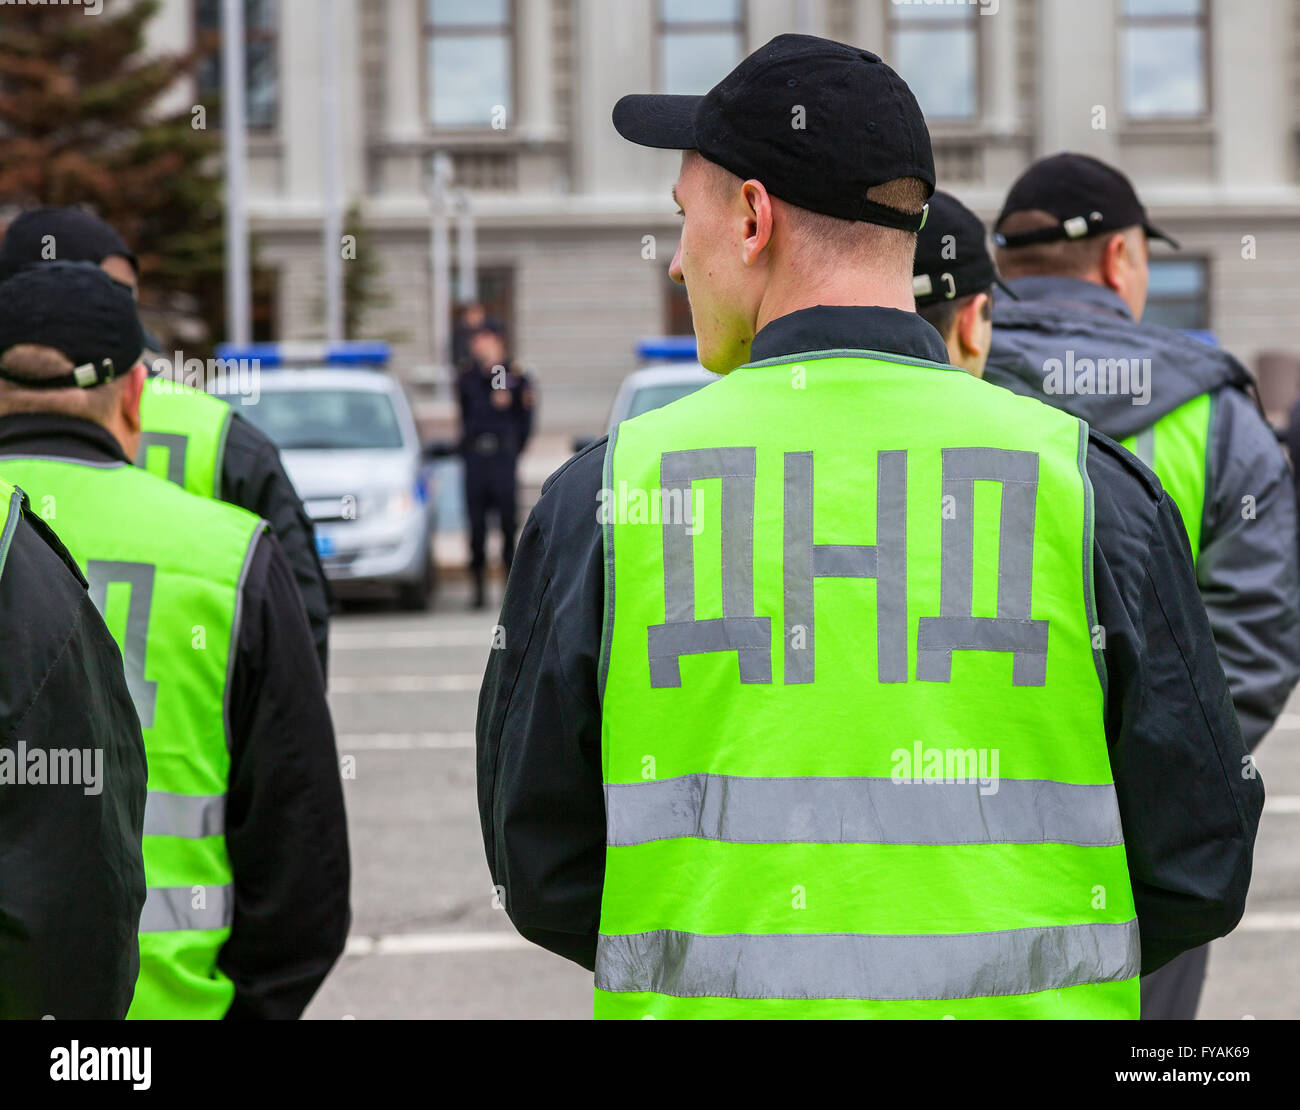 Russian helper police. Voluntary National Teams in uniform - Stock Image